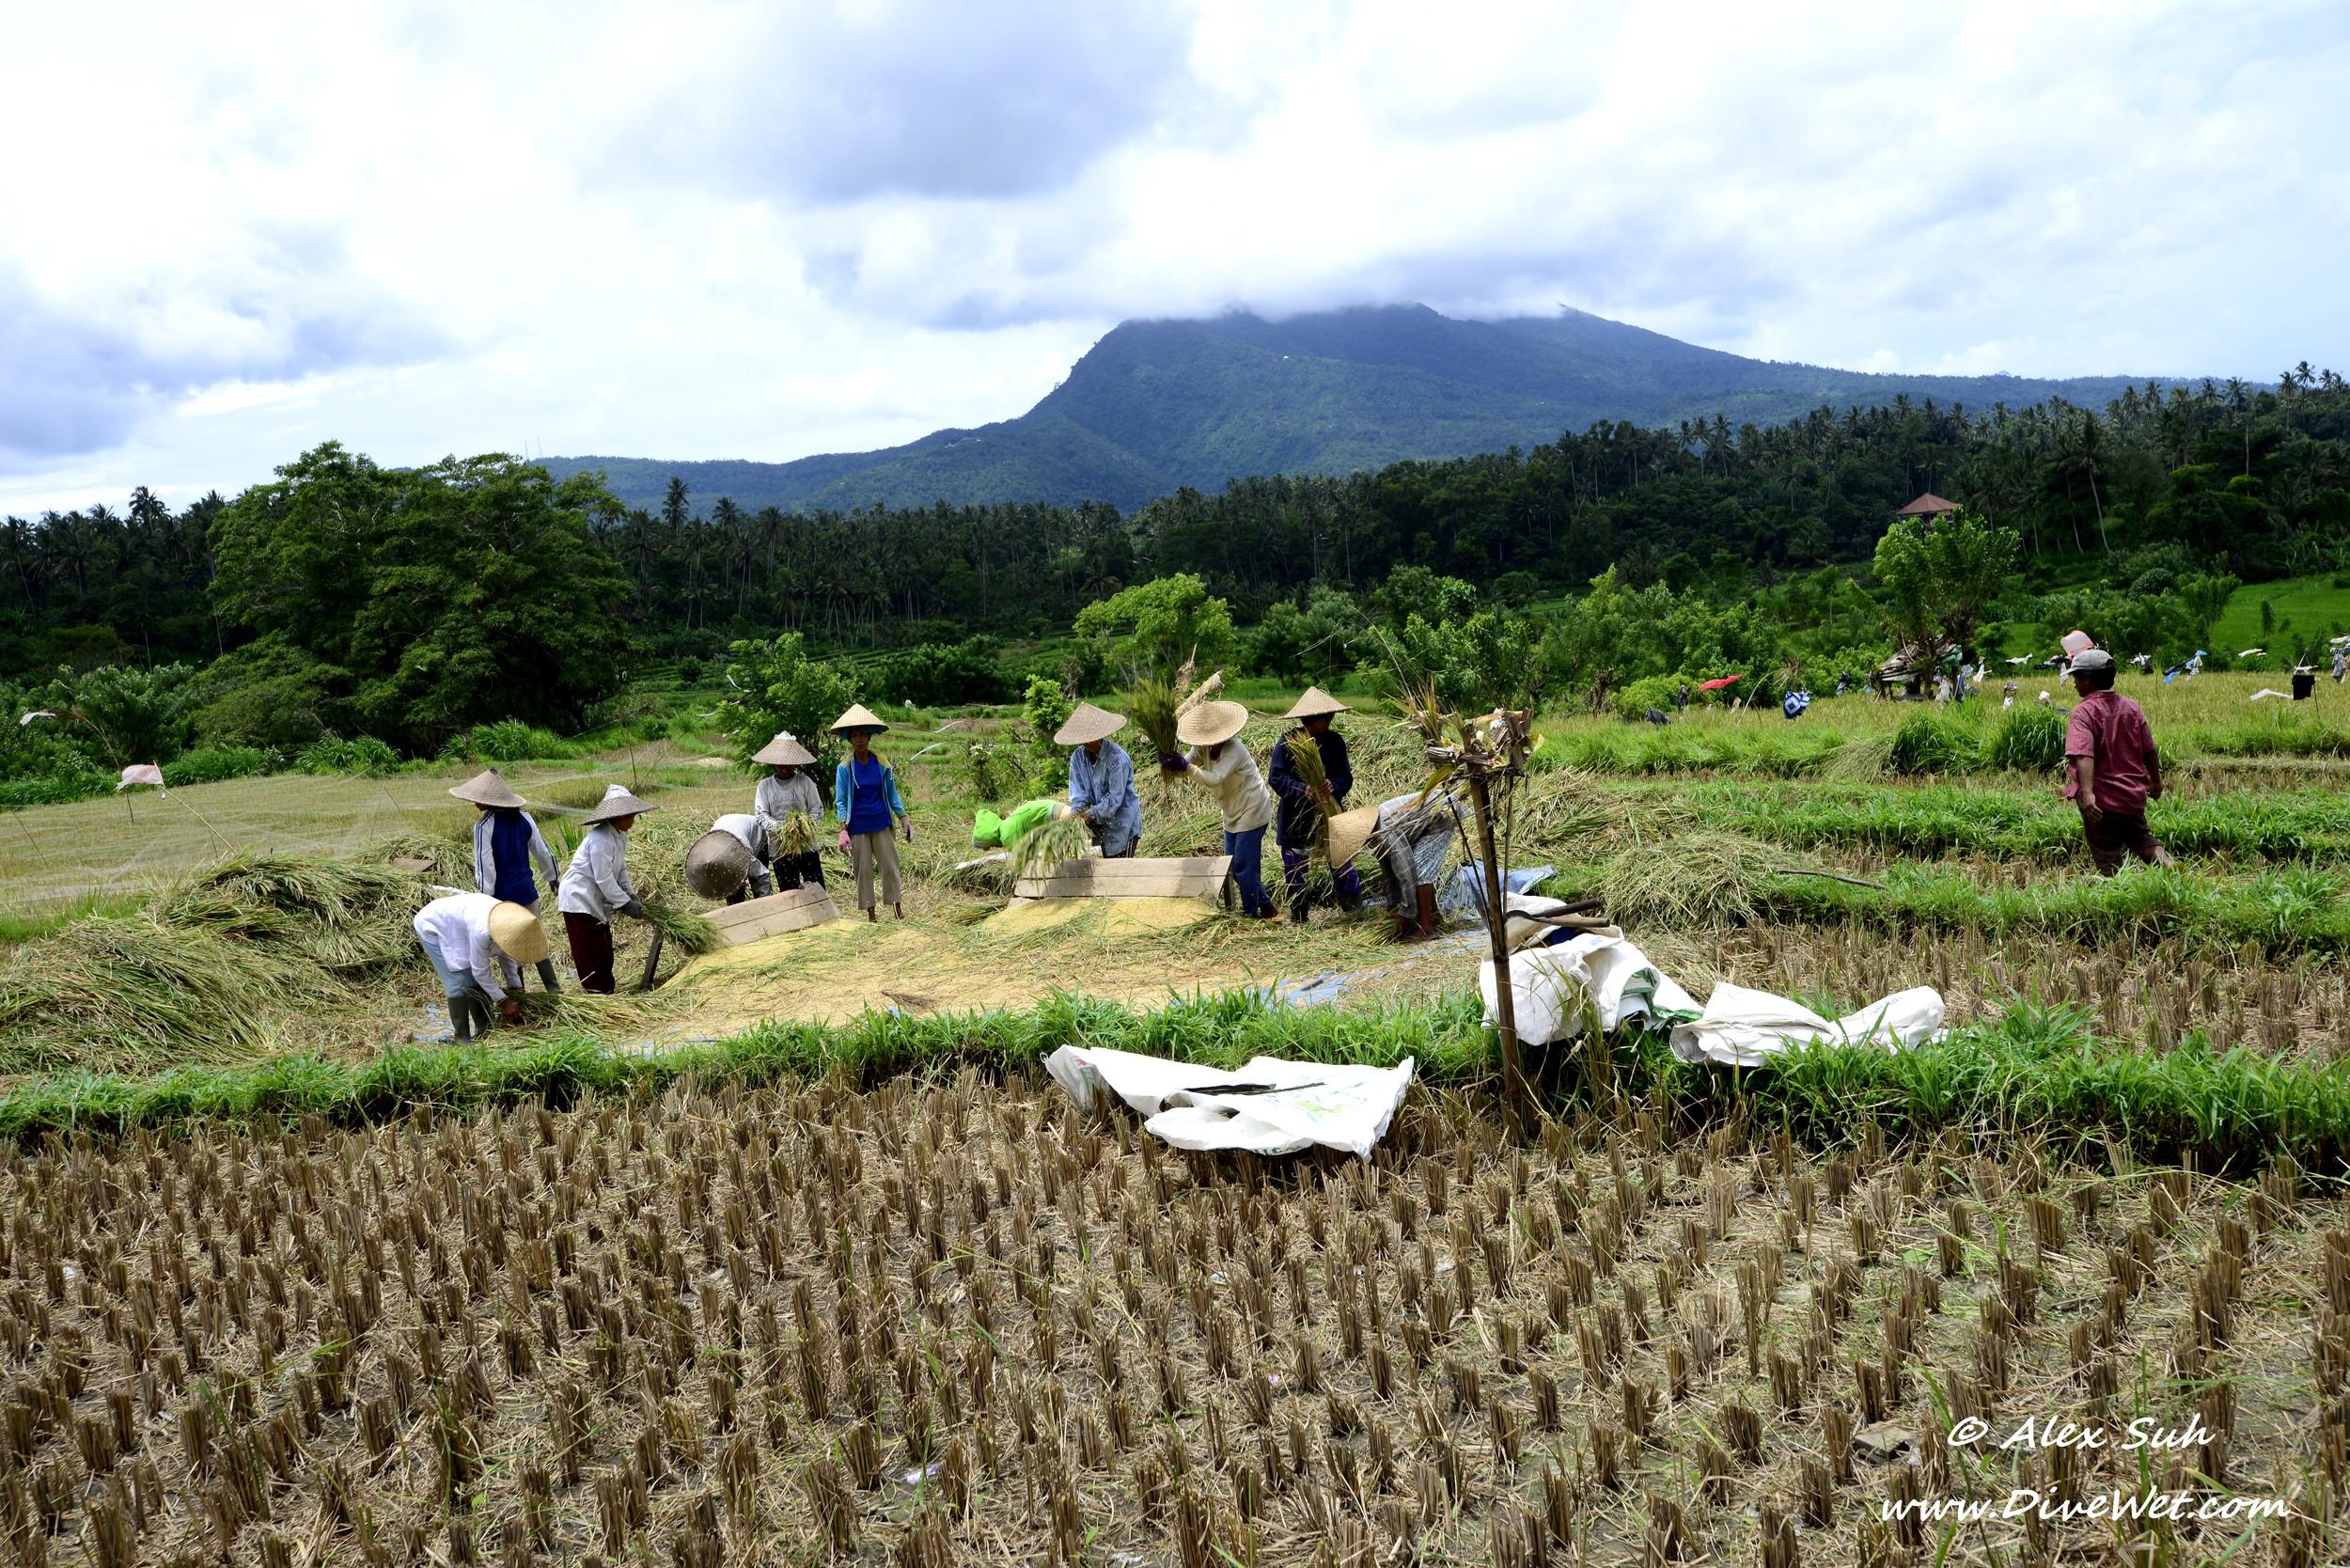 Bali Rice Field Workers.jpg